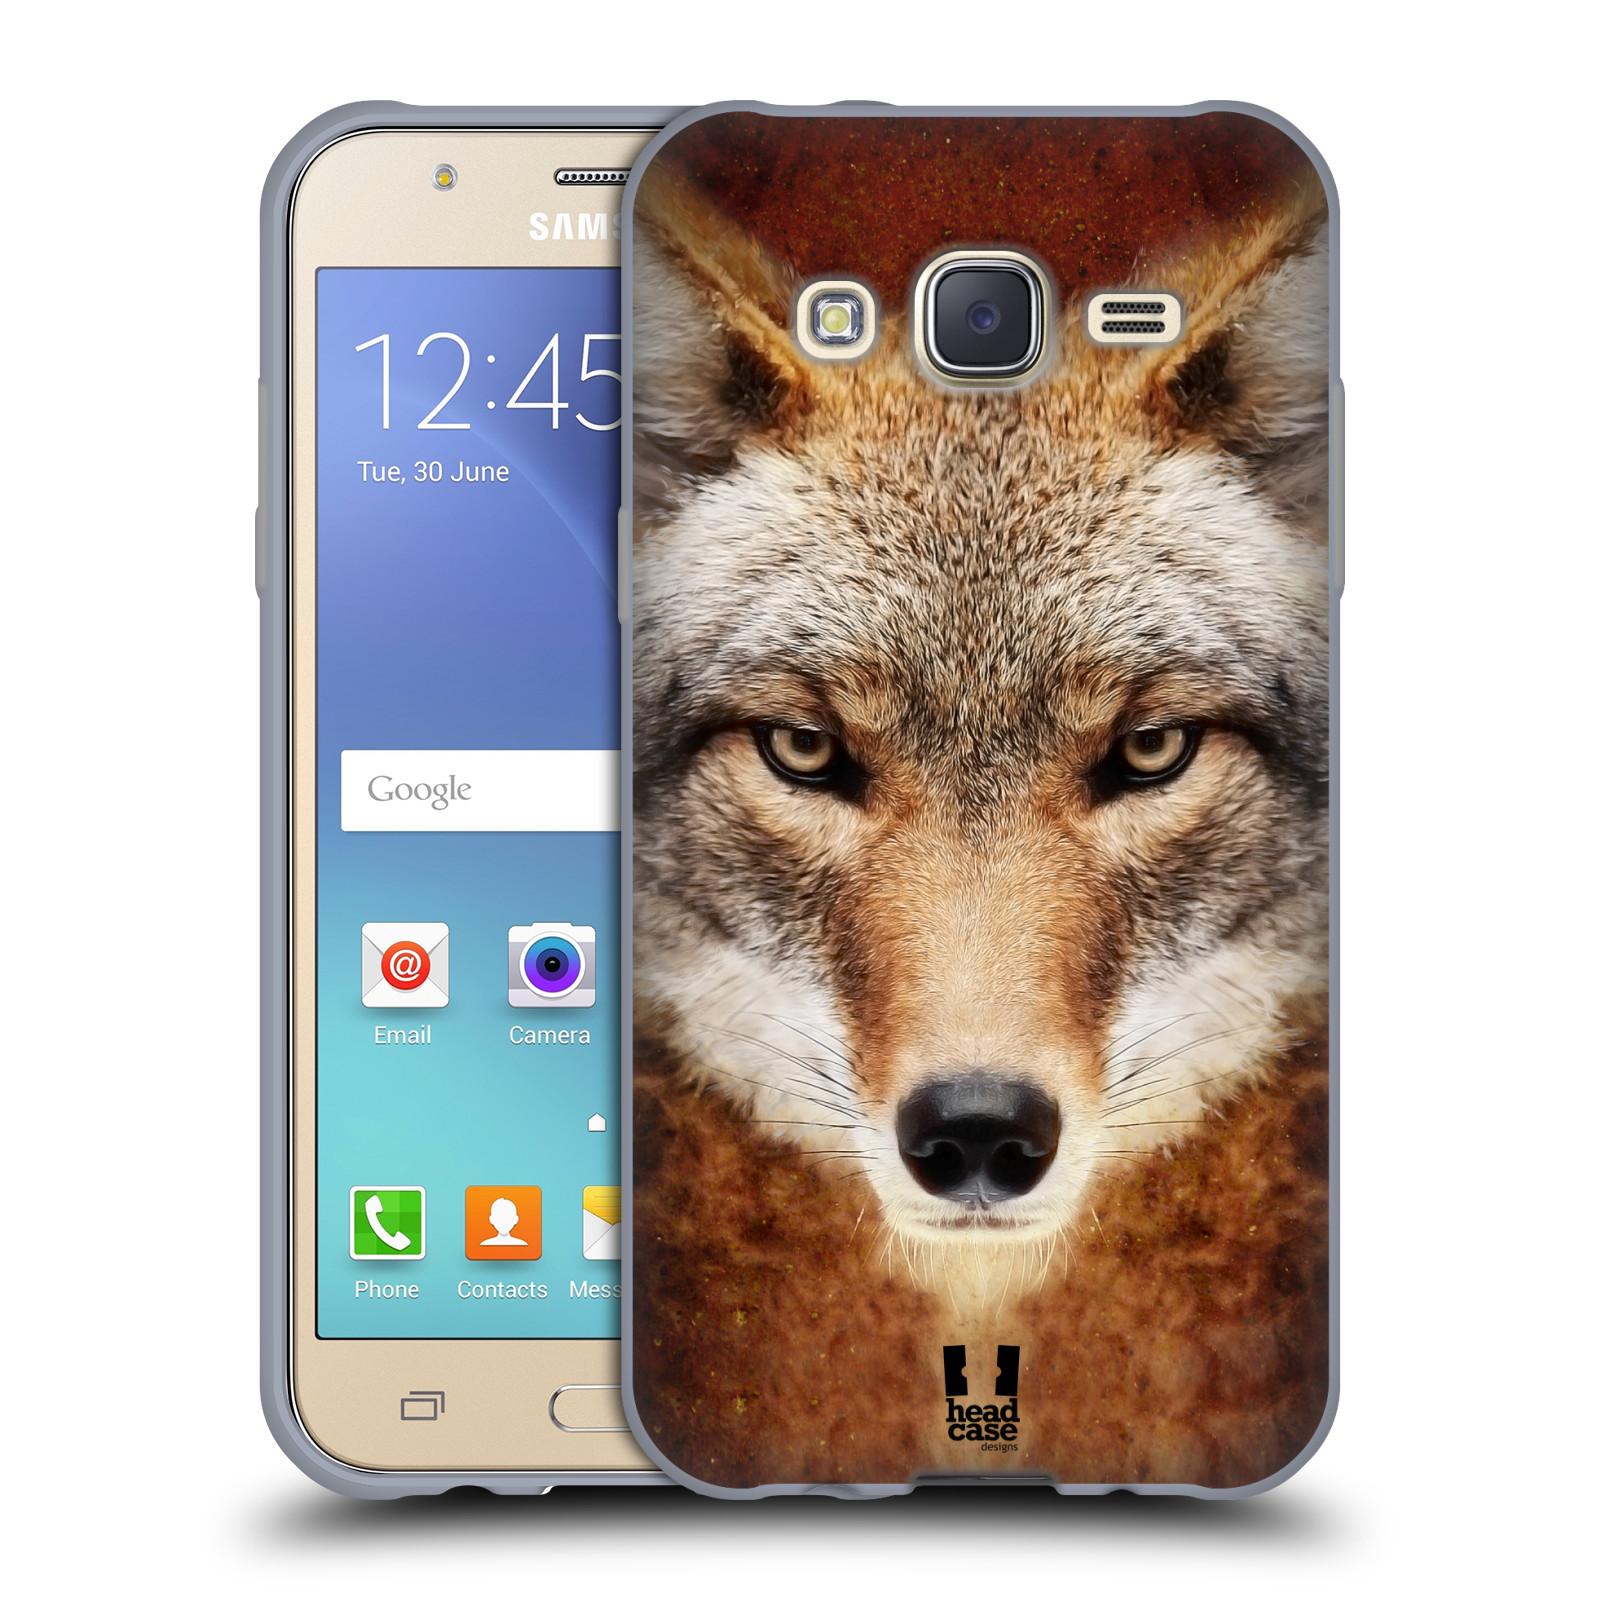 HEAD CASE silikonový obal na mobil Samsung Galaxy J5, J500, (J5 DUOS) vzor Zvířecí tváře kojot